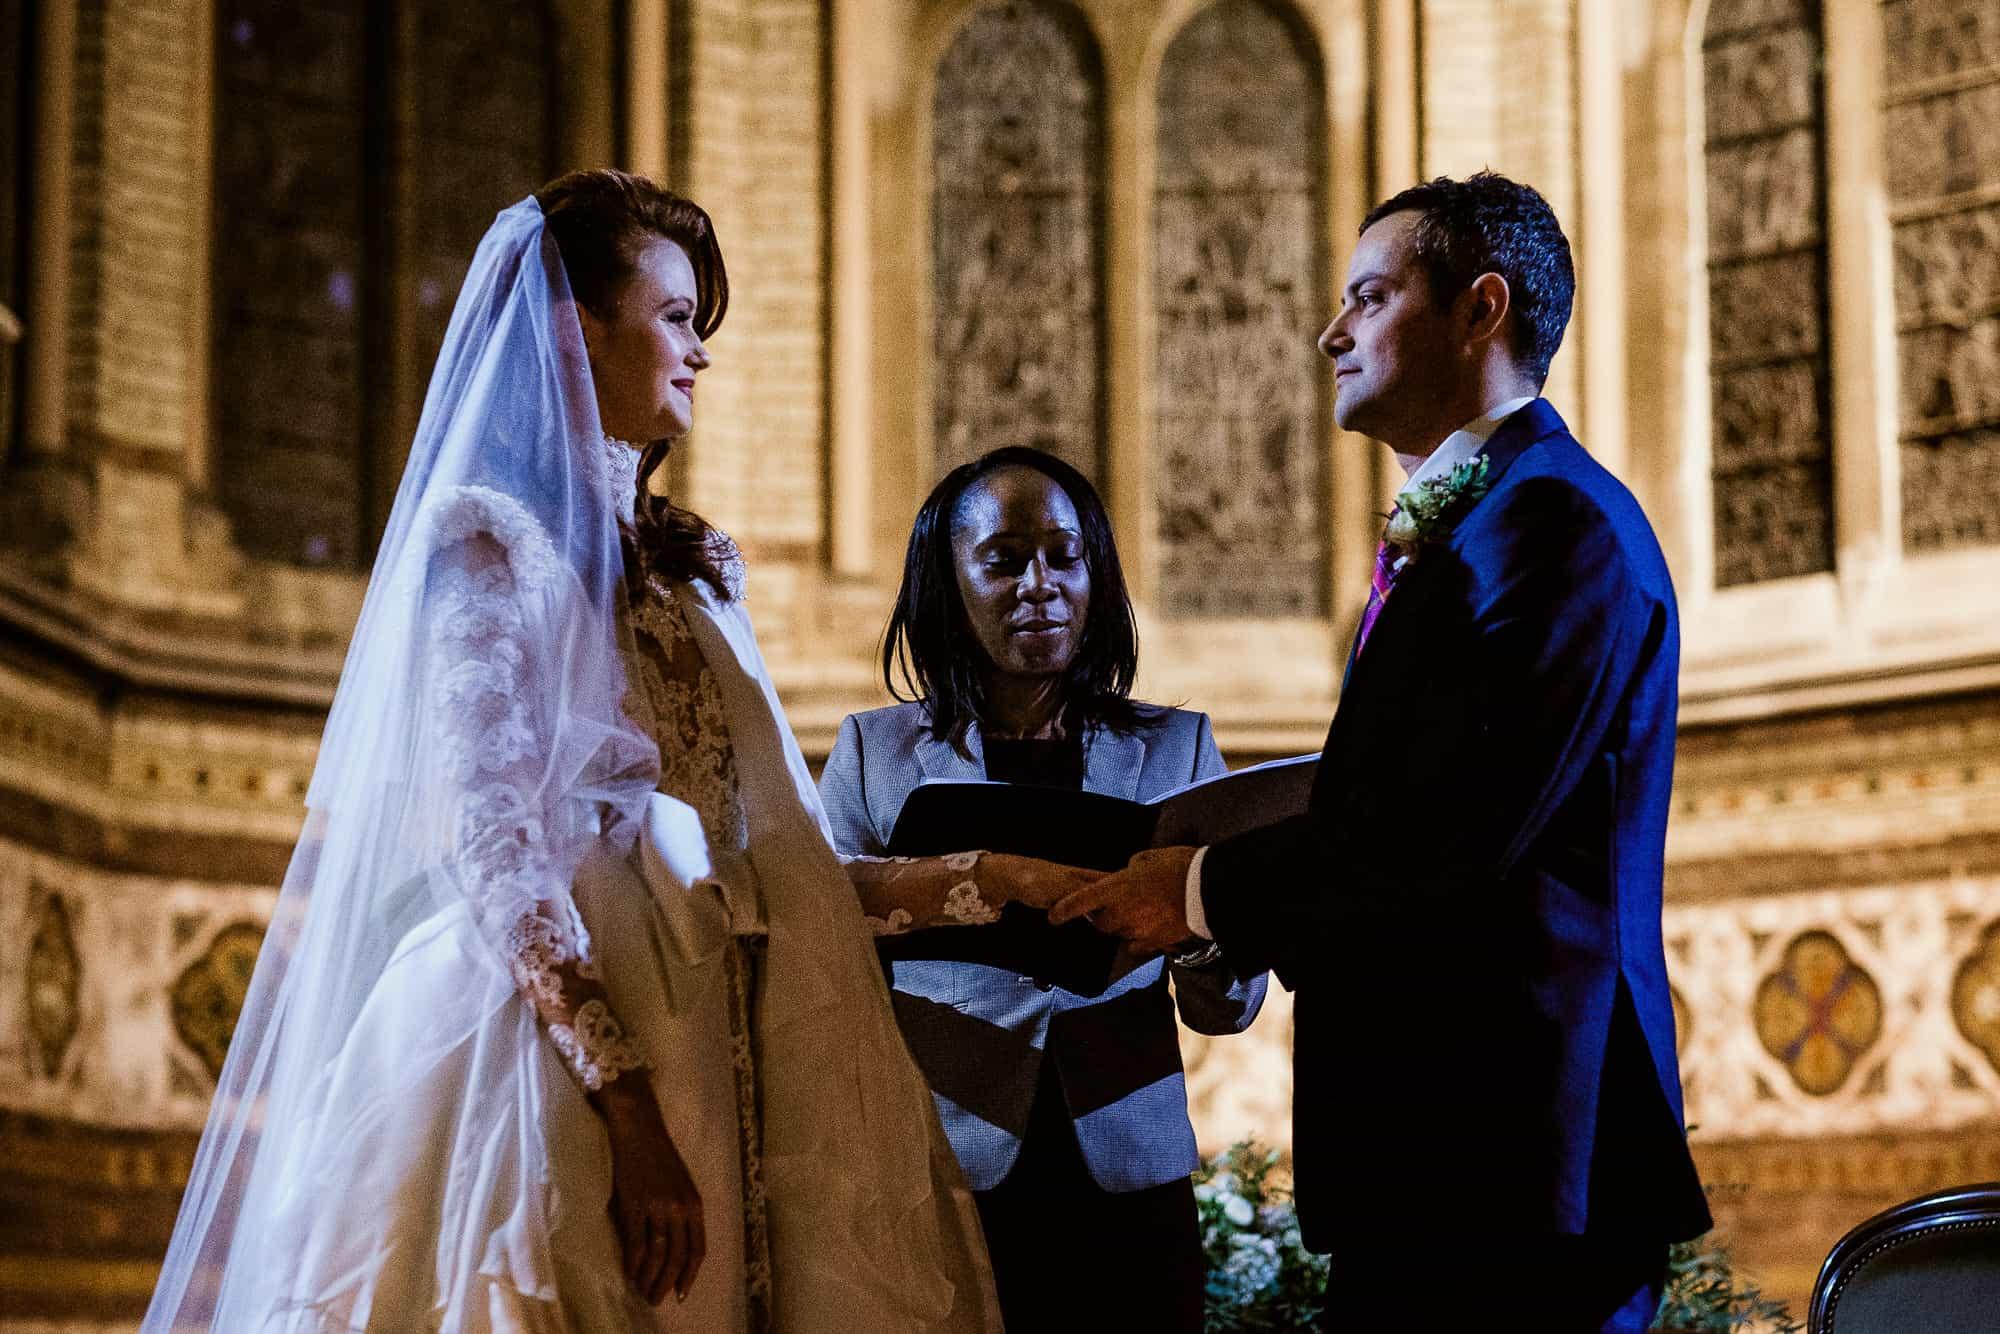 st-stephens-wedding-photographer-matt-tyler-0028